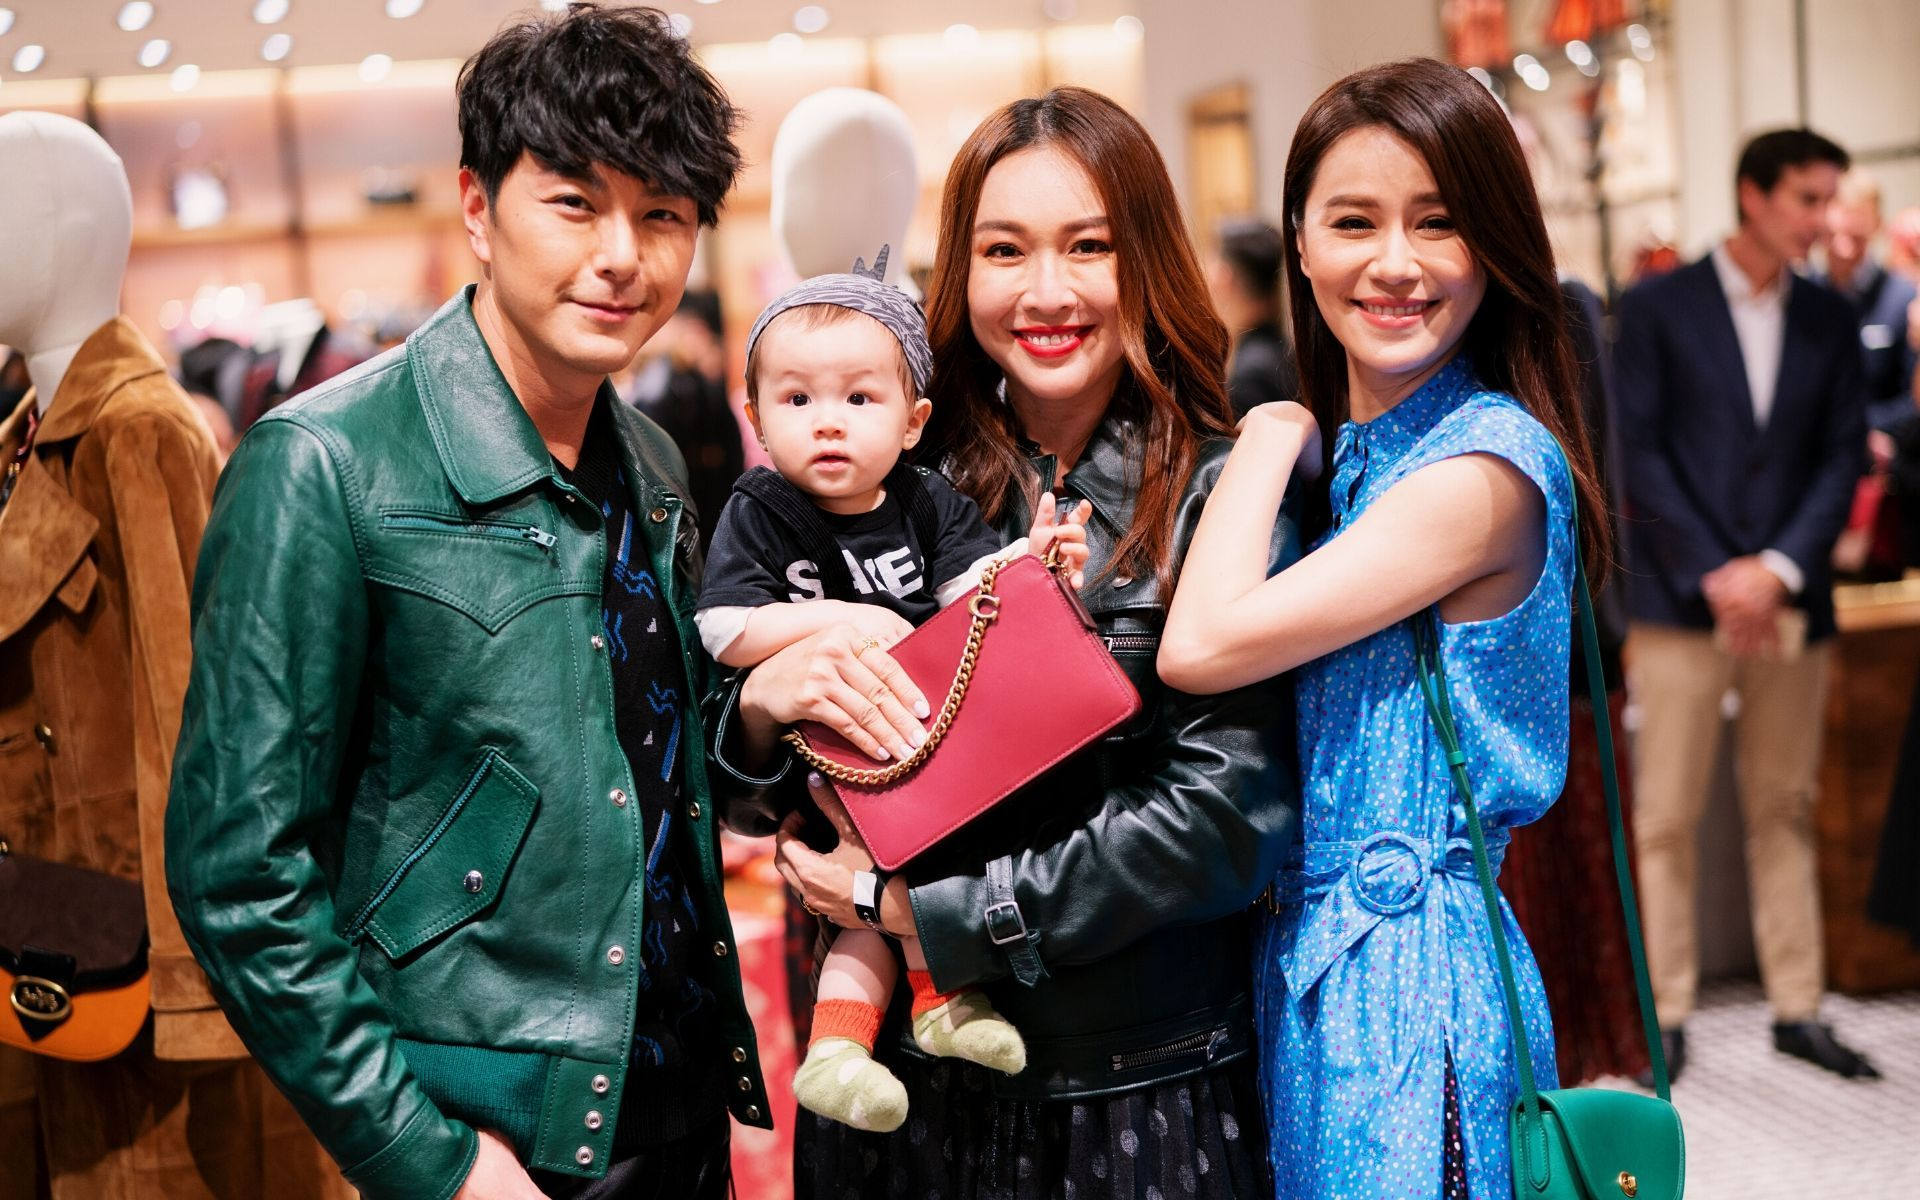 Edwin Siu, Debbie Goh and Priscilla Wong with Goh's baby, Danton Lee